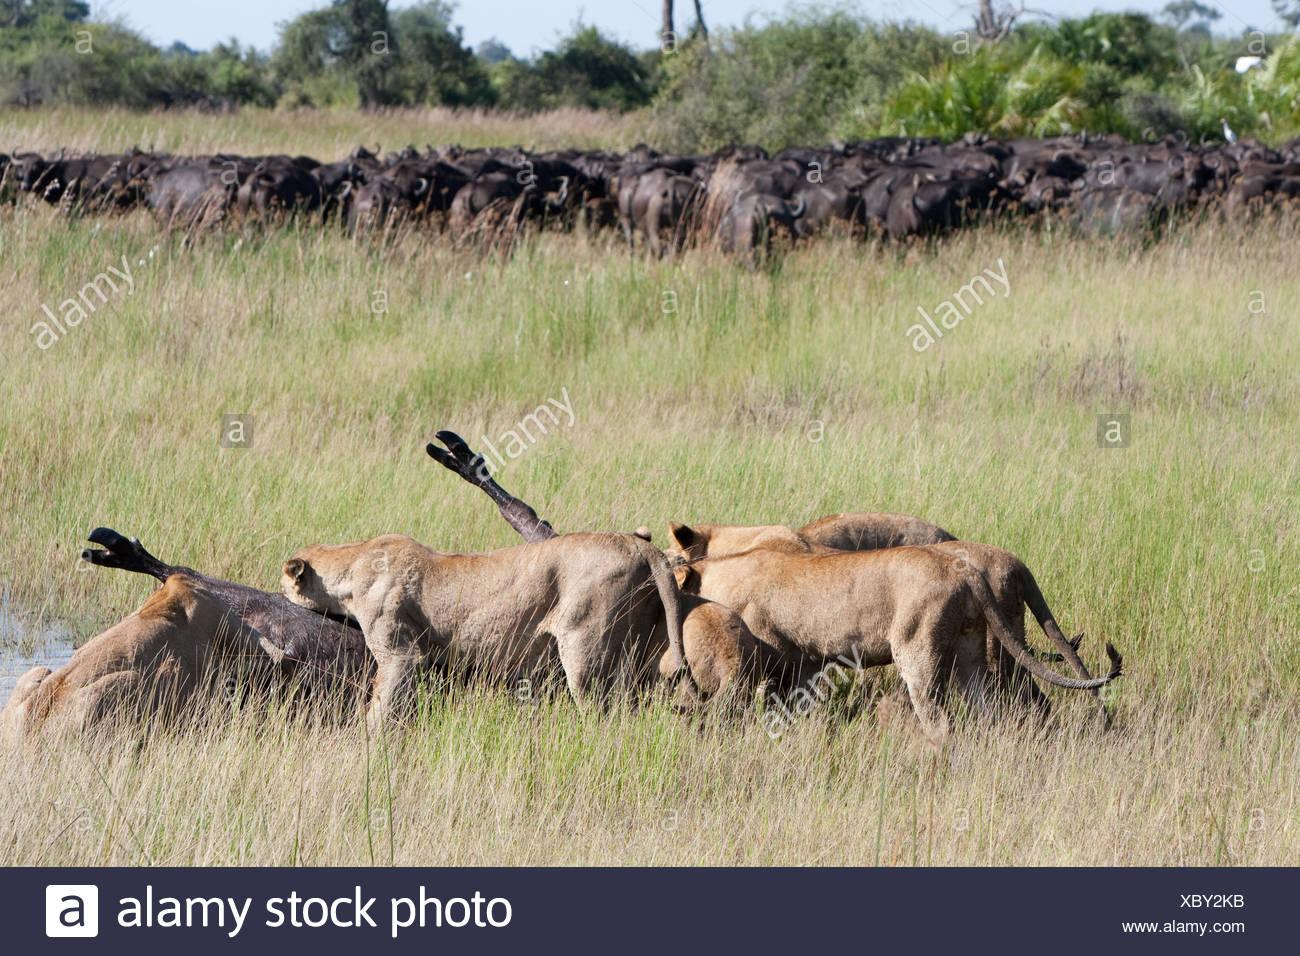 Female South African lions feeding on a freshly killed Cape buffalo. - Stock Image